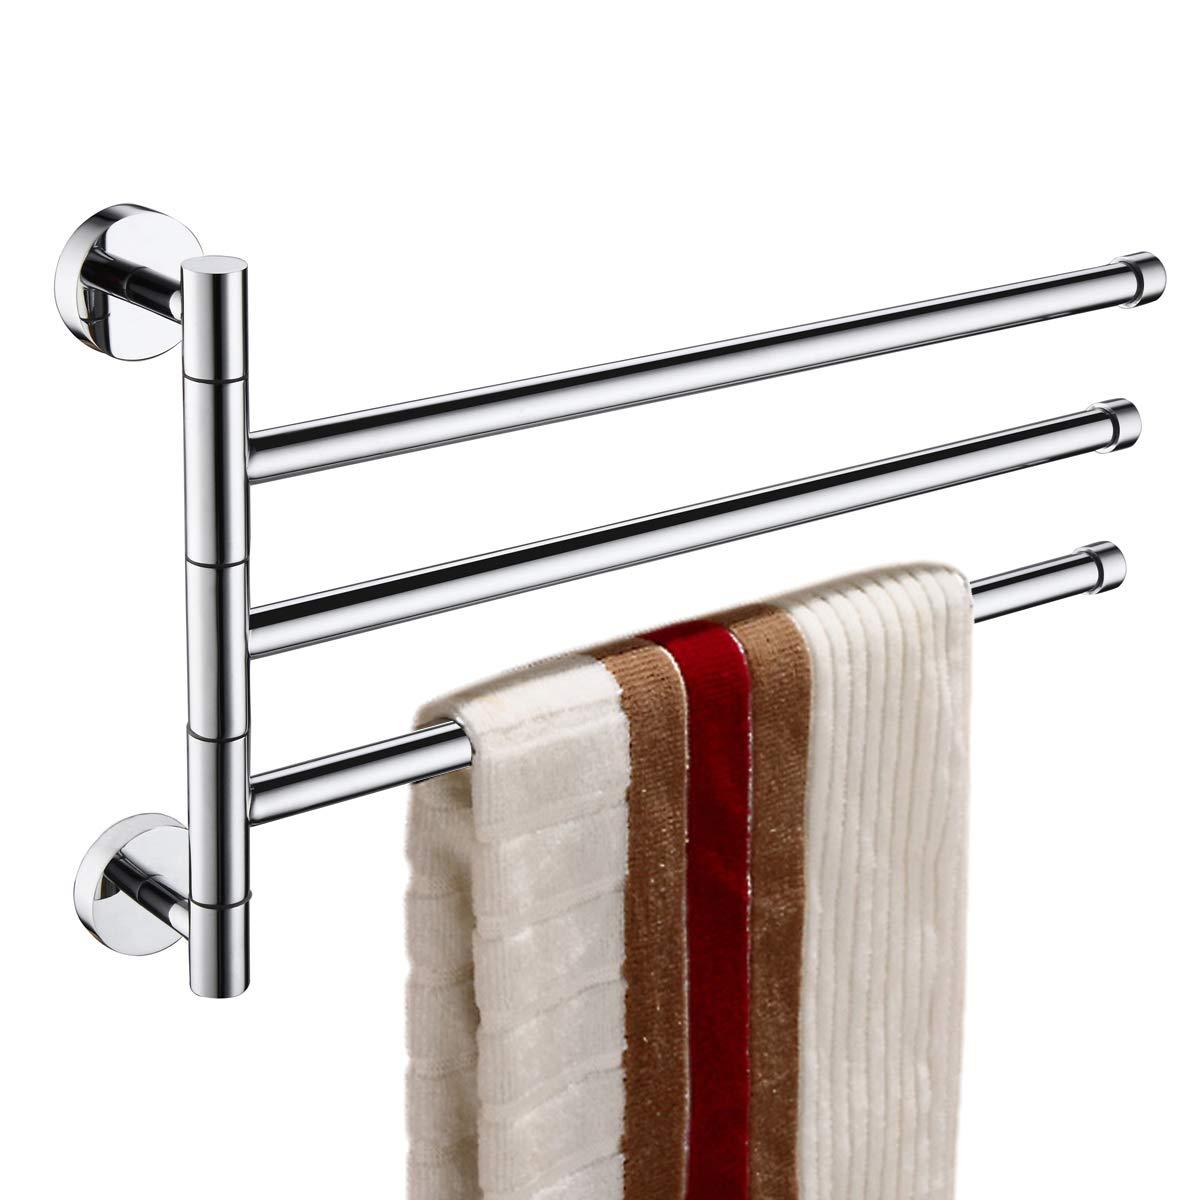 ThinkTop Luxury Bathroom Brass Rotate Three Swing Arms Towel Bar Rail Rack Holder Wall Mounted Swivel Holder Chrome Polishing Bathroom Accessories